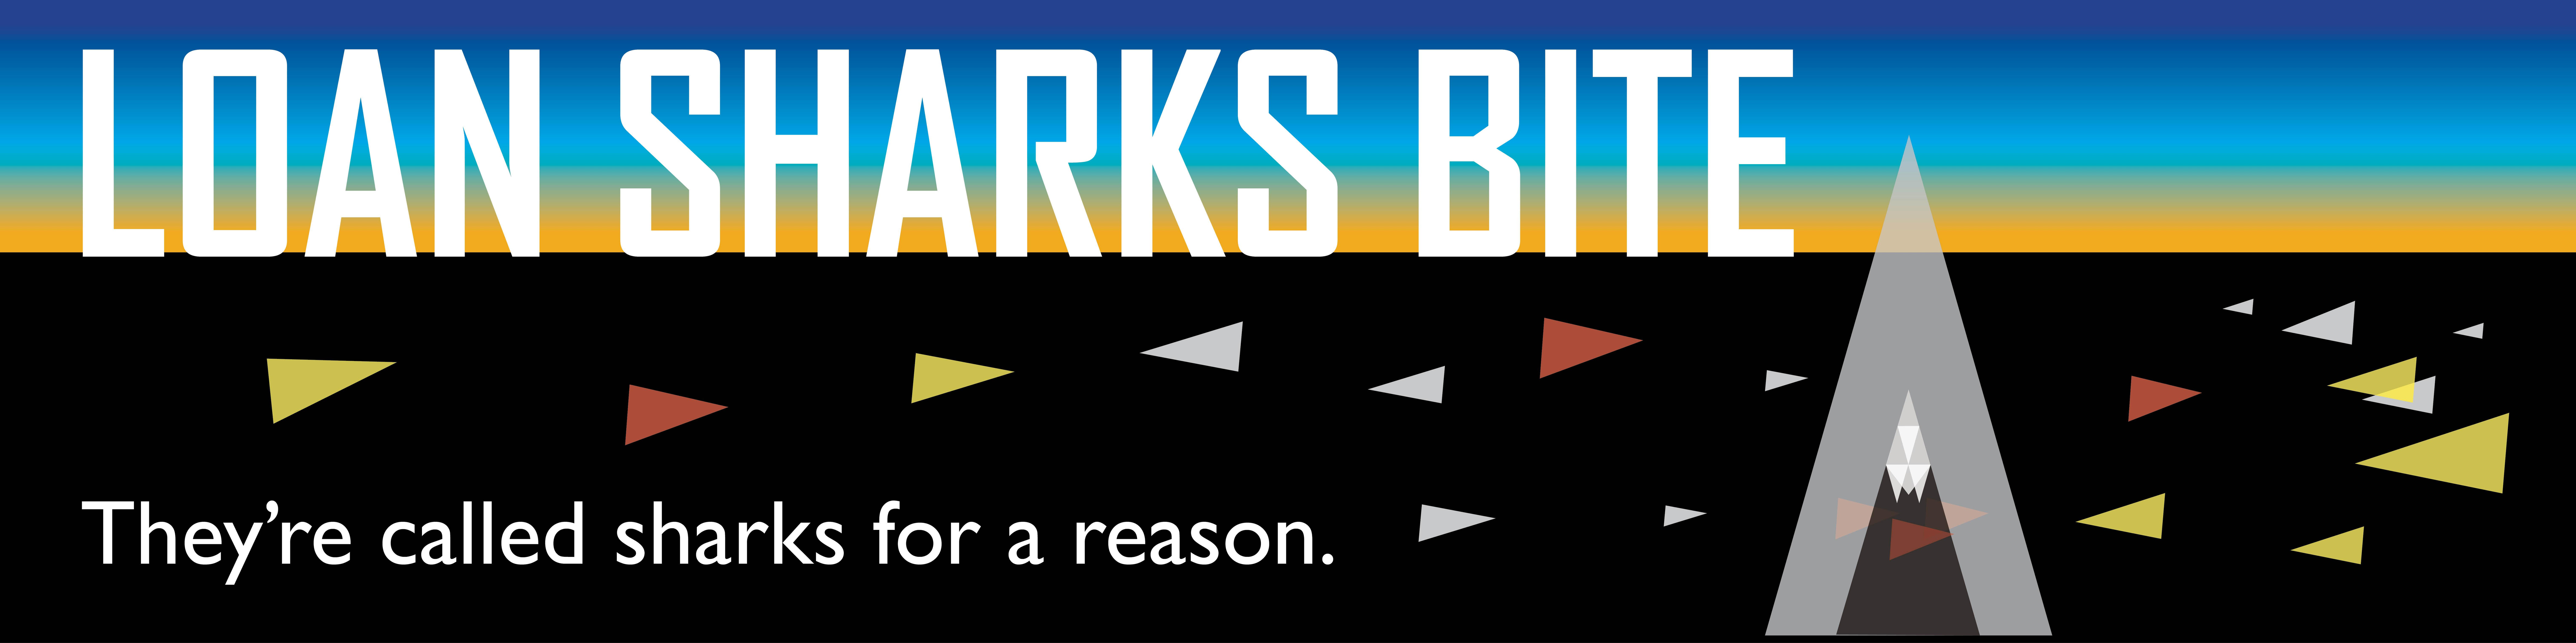 Web header which reads 'Lona Sharks Bite'